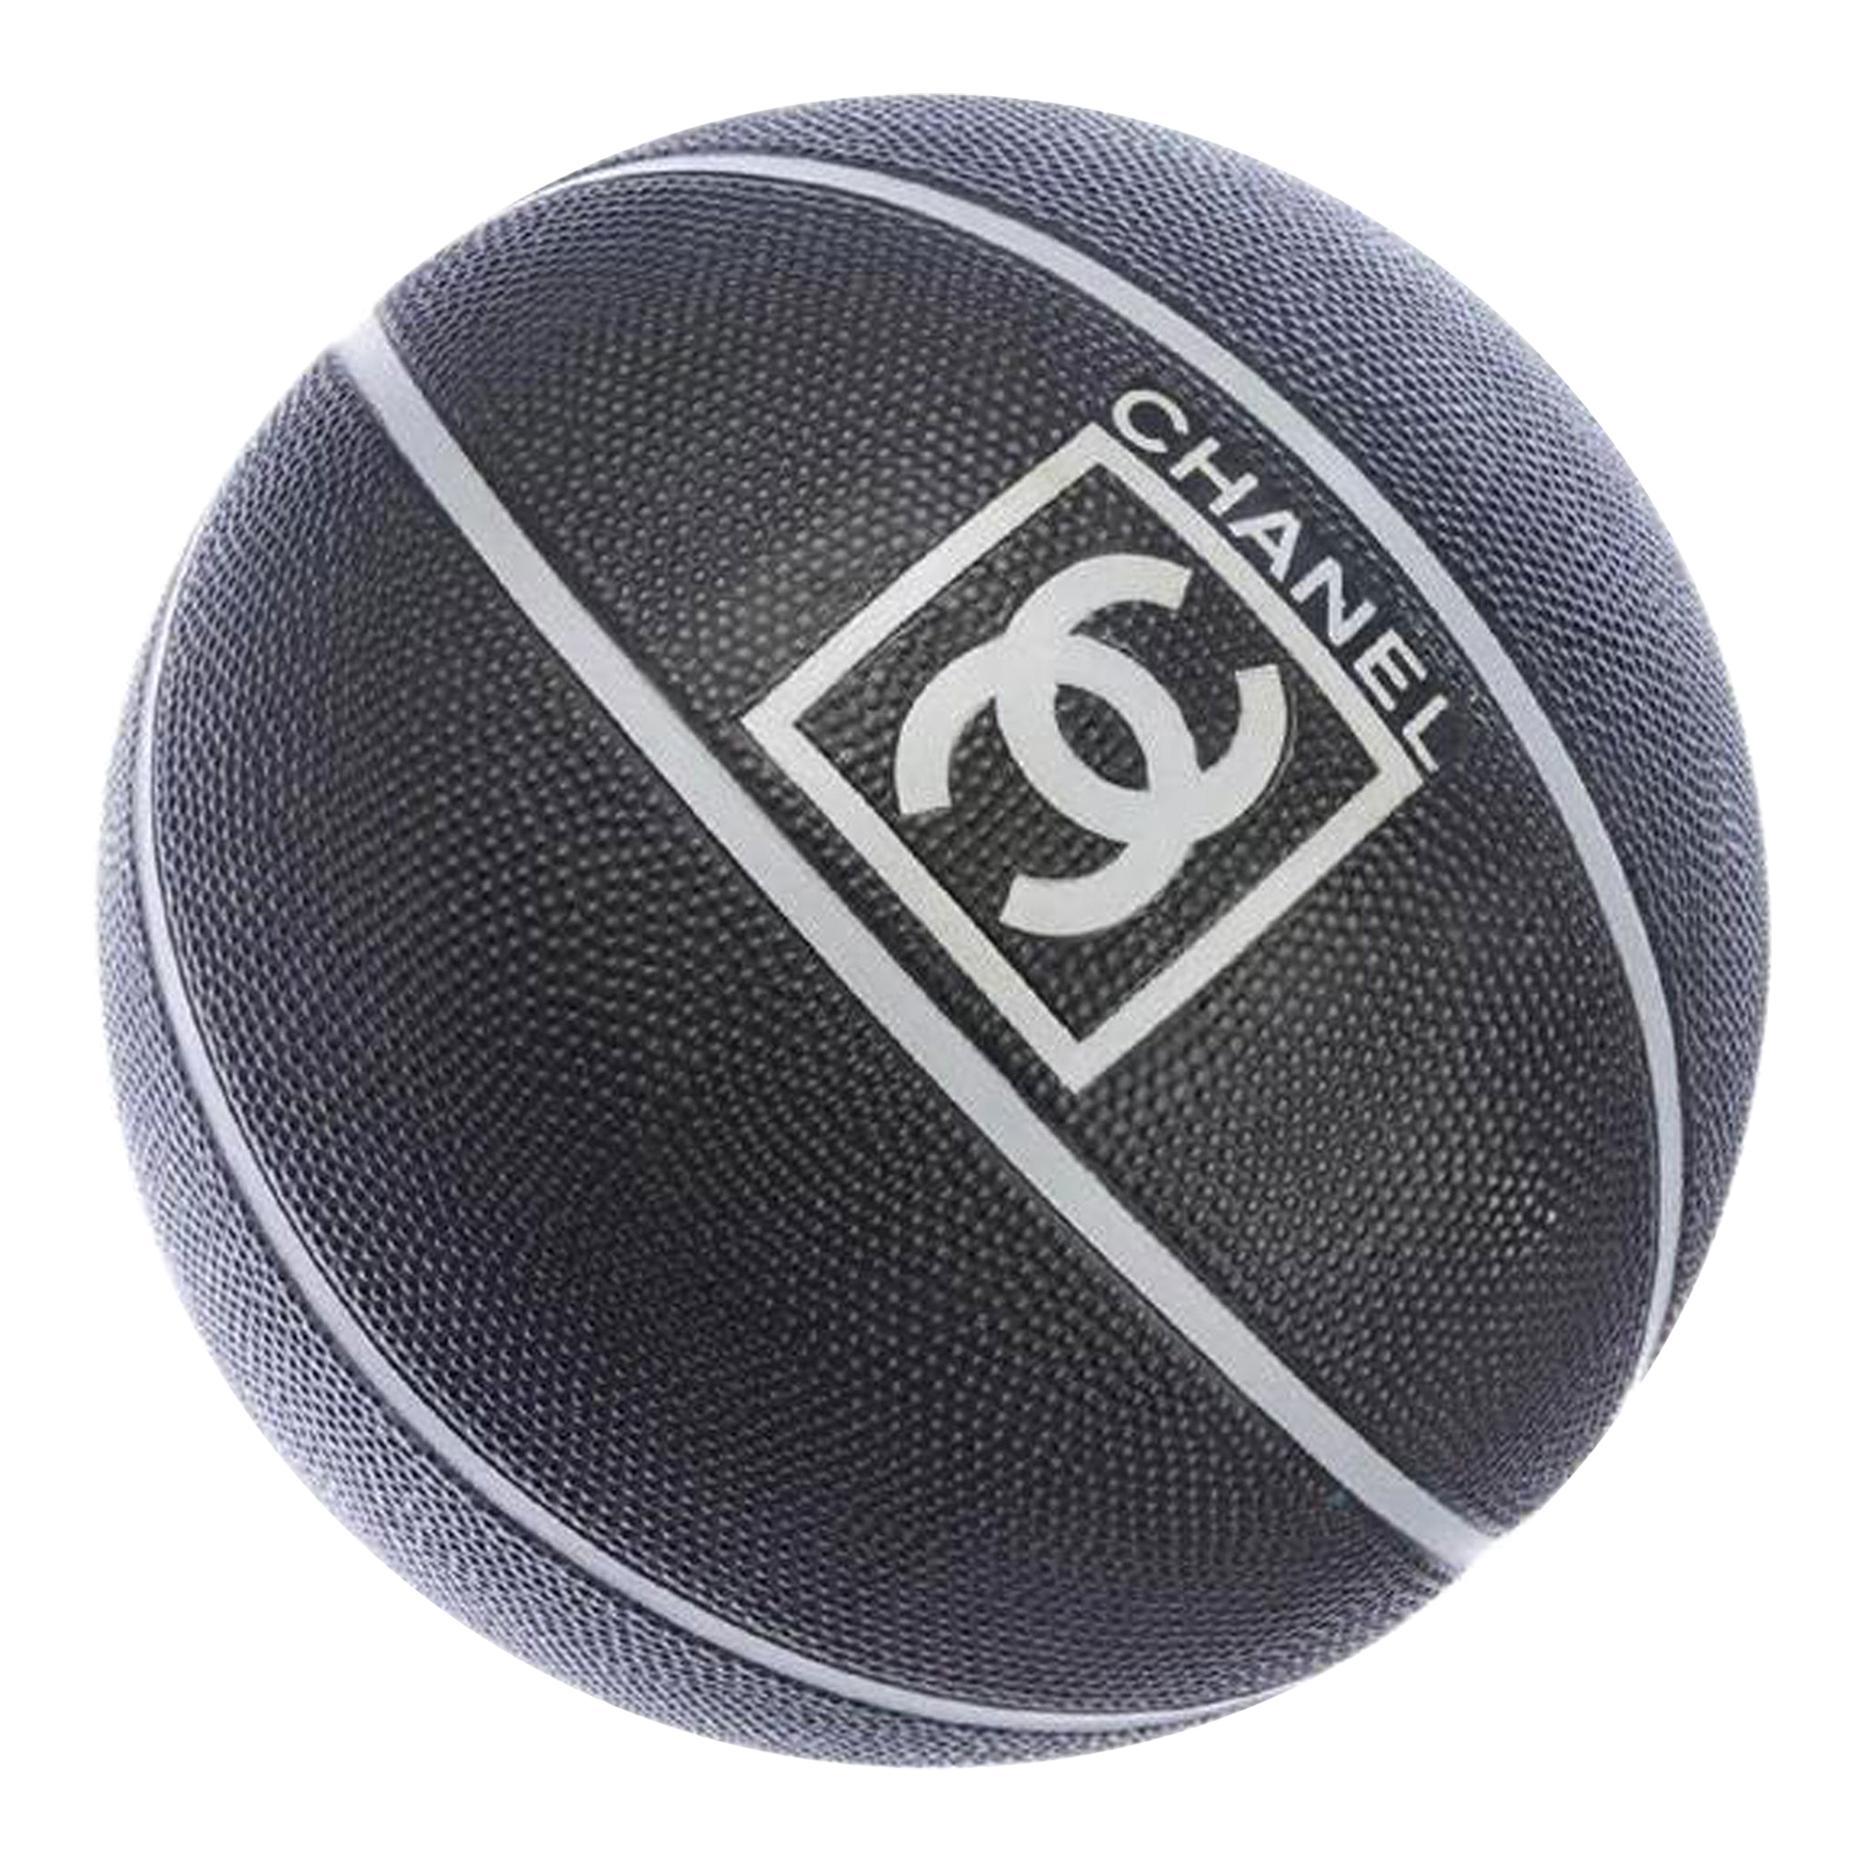 Chanel Vintage Basketball